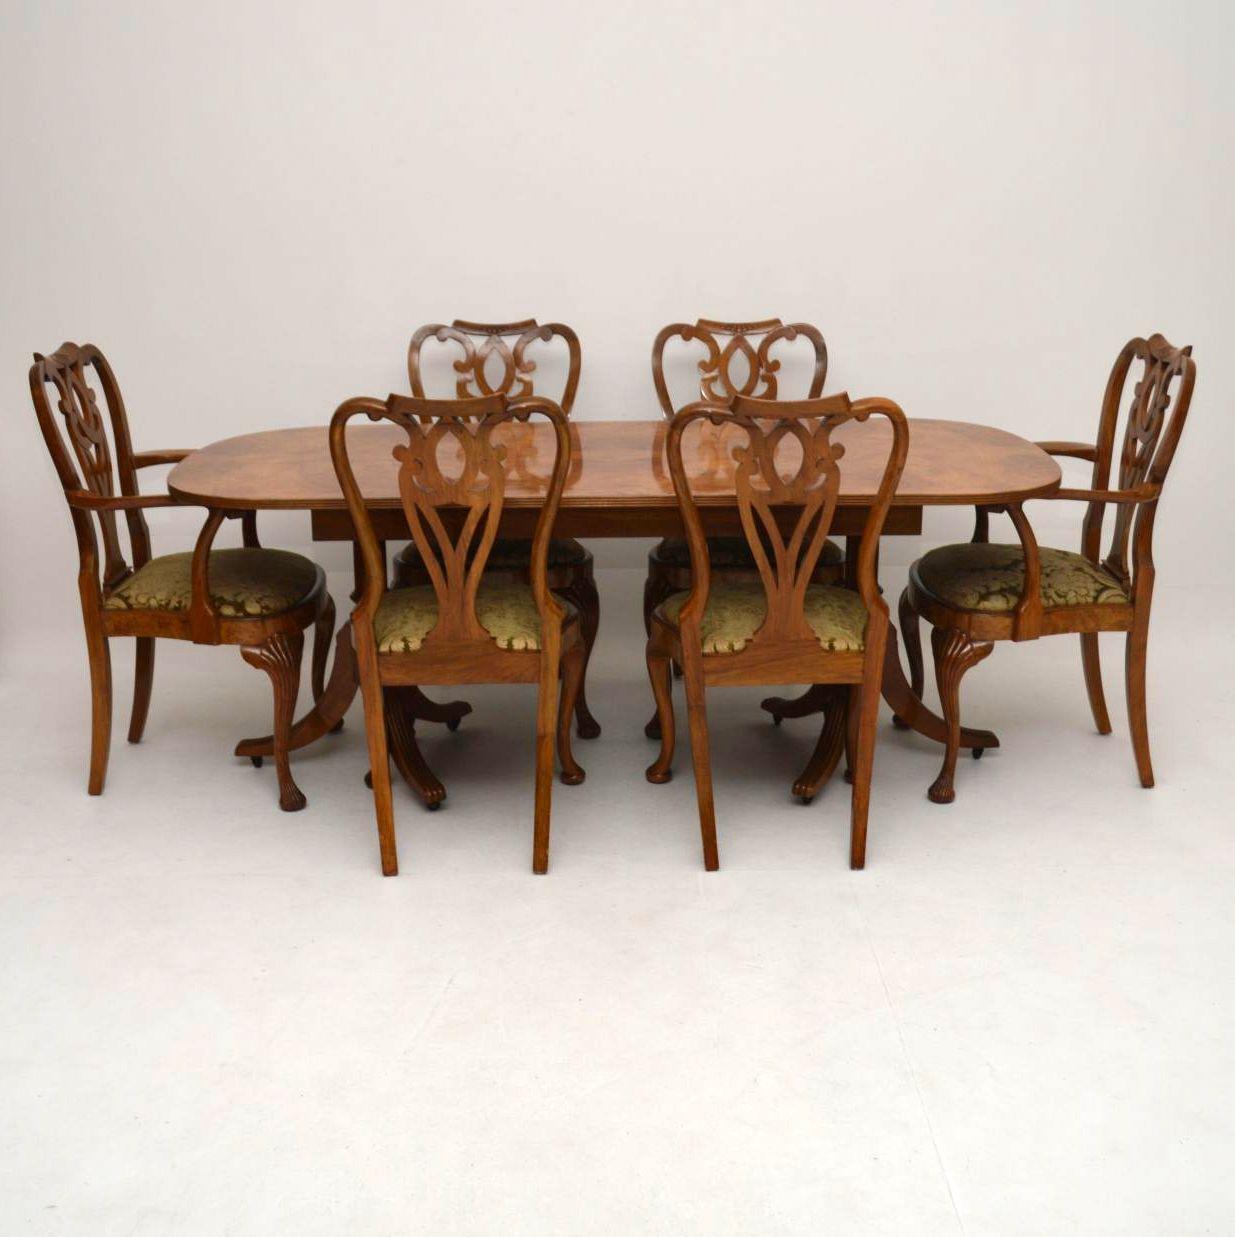 Antique Burr Maple Walnut Dining Table Plus 6 Chairs Interior